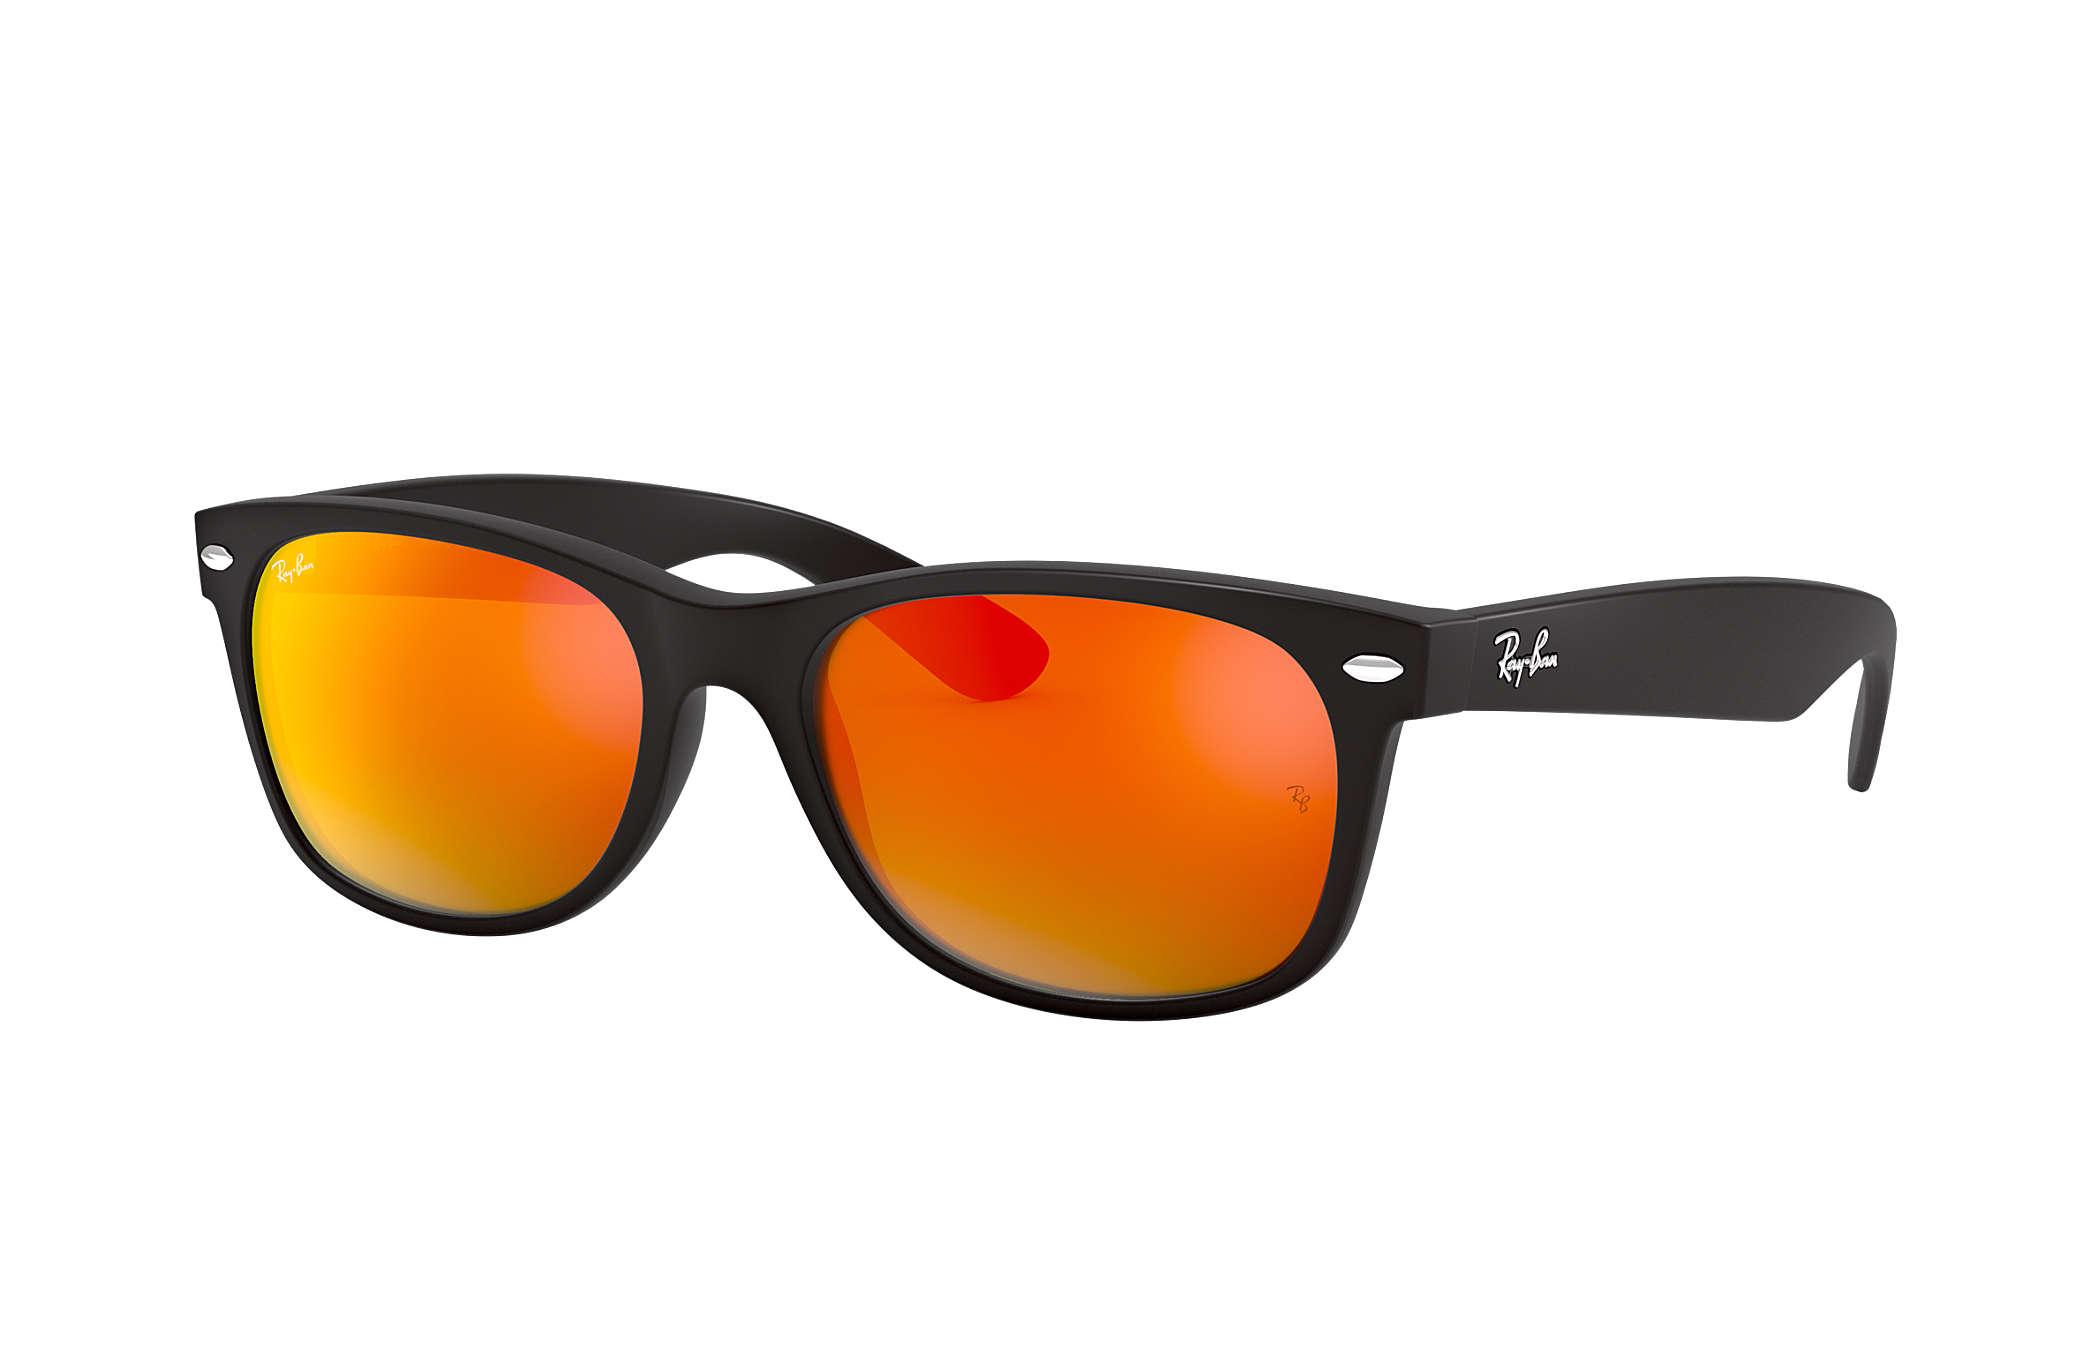 f9617c92174 Ray-Ban New Wayfarer Flash RB2132 Black - Nylon - Orange Lenses ...